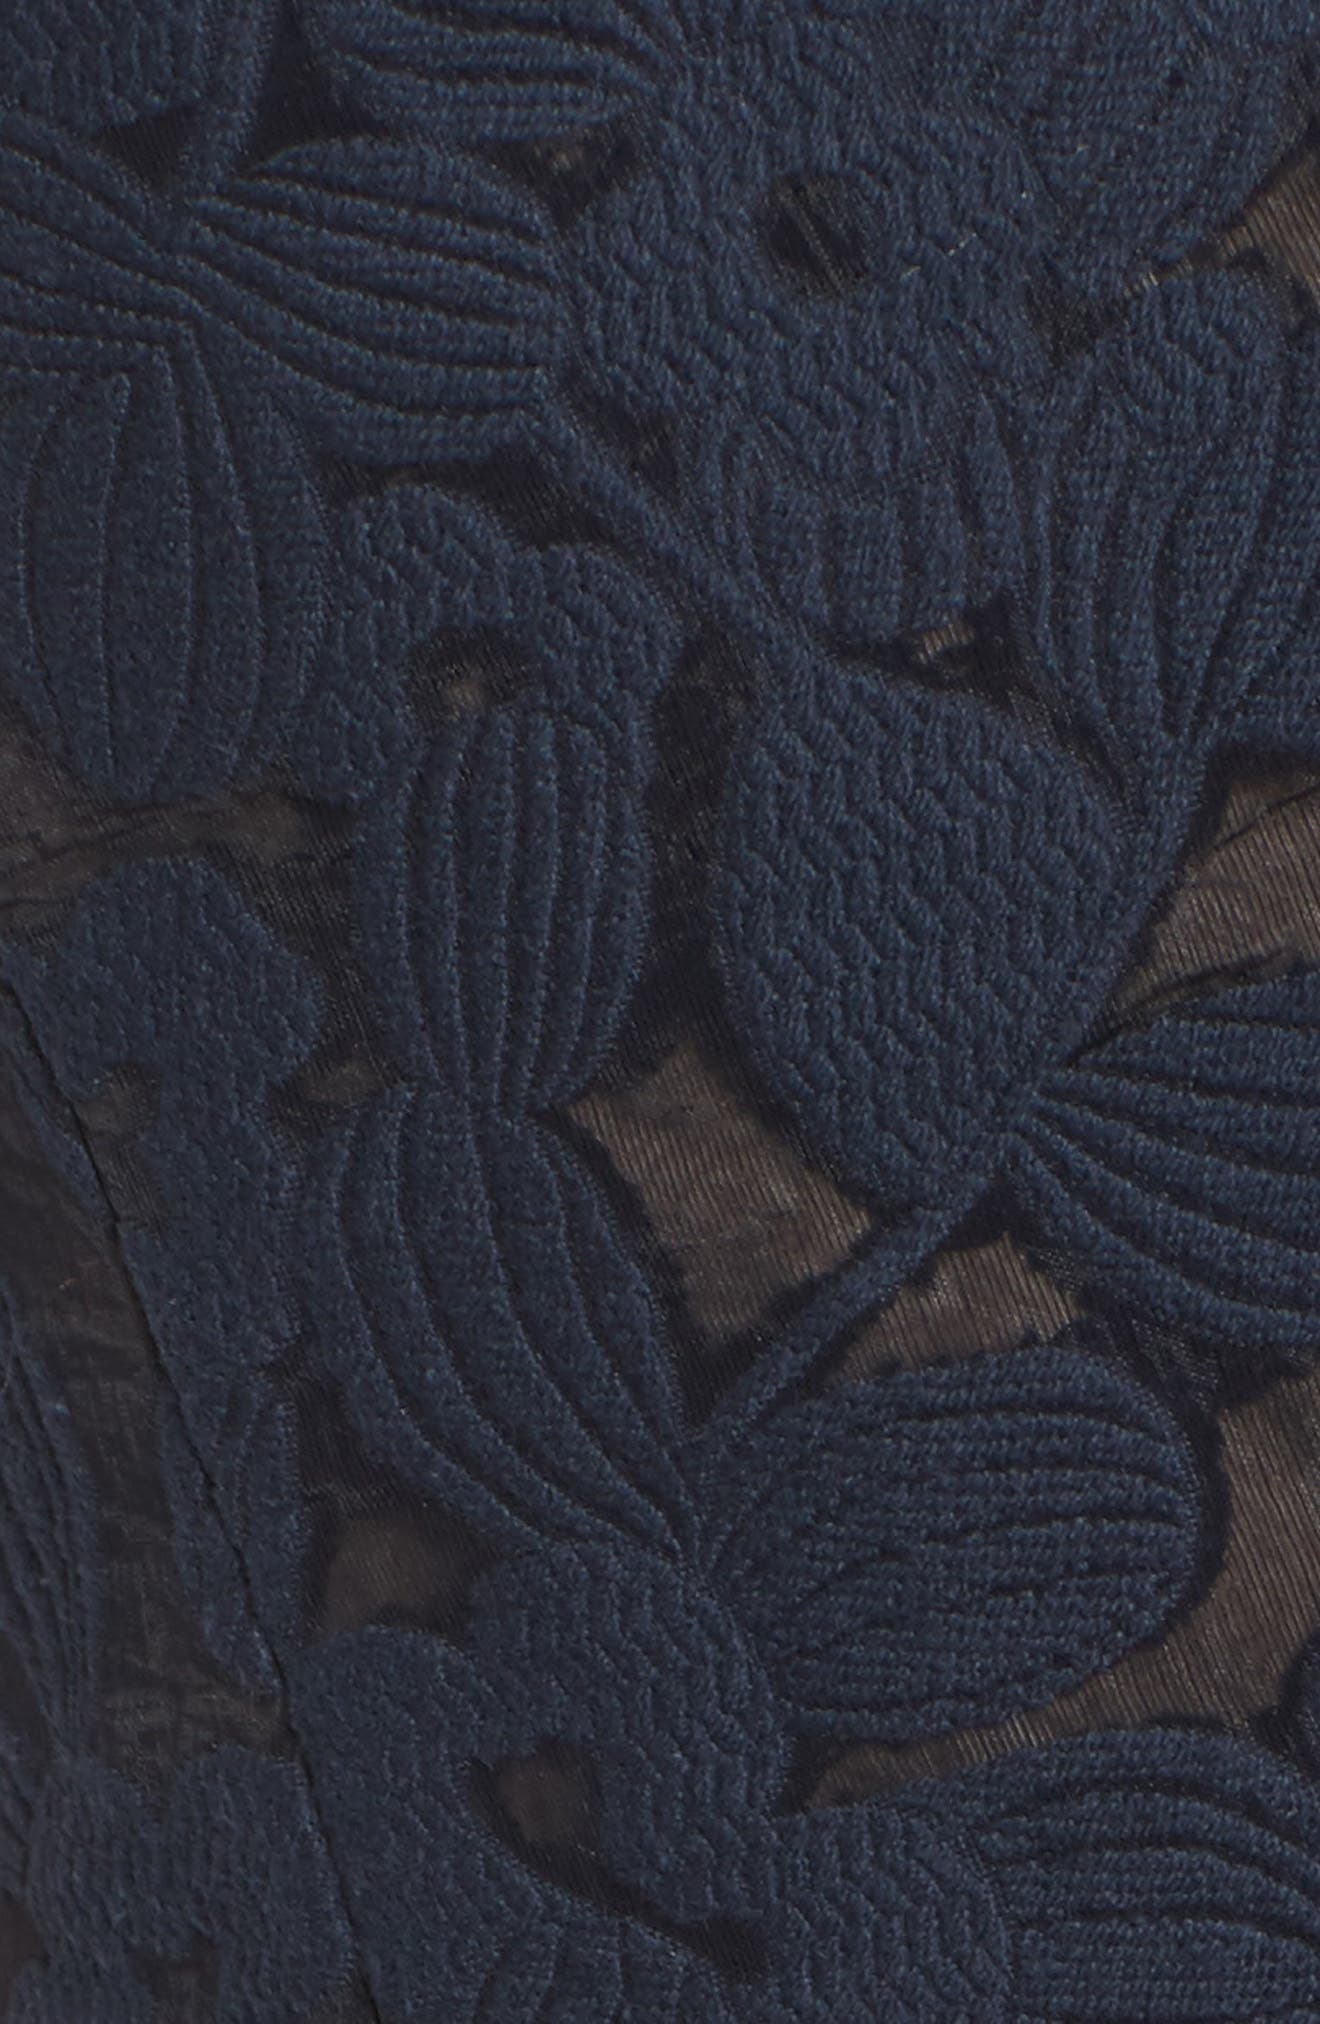 Fit & Flare Dress,                             Alternate thumbnail 5, color,                             Dark Navy